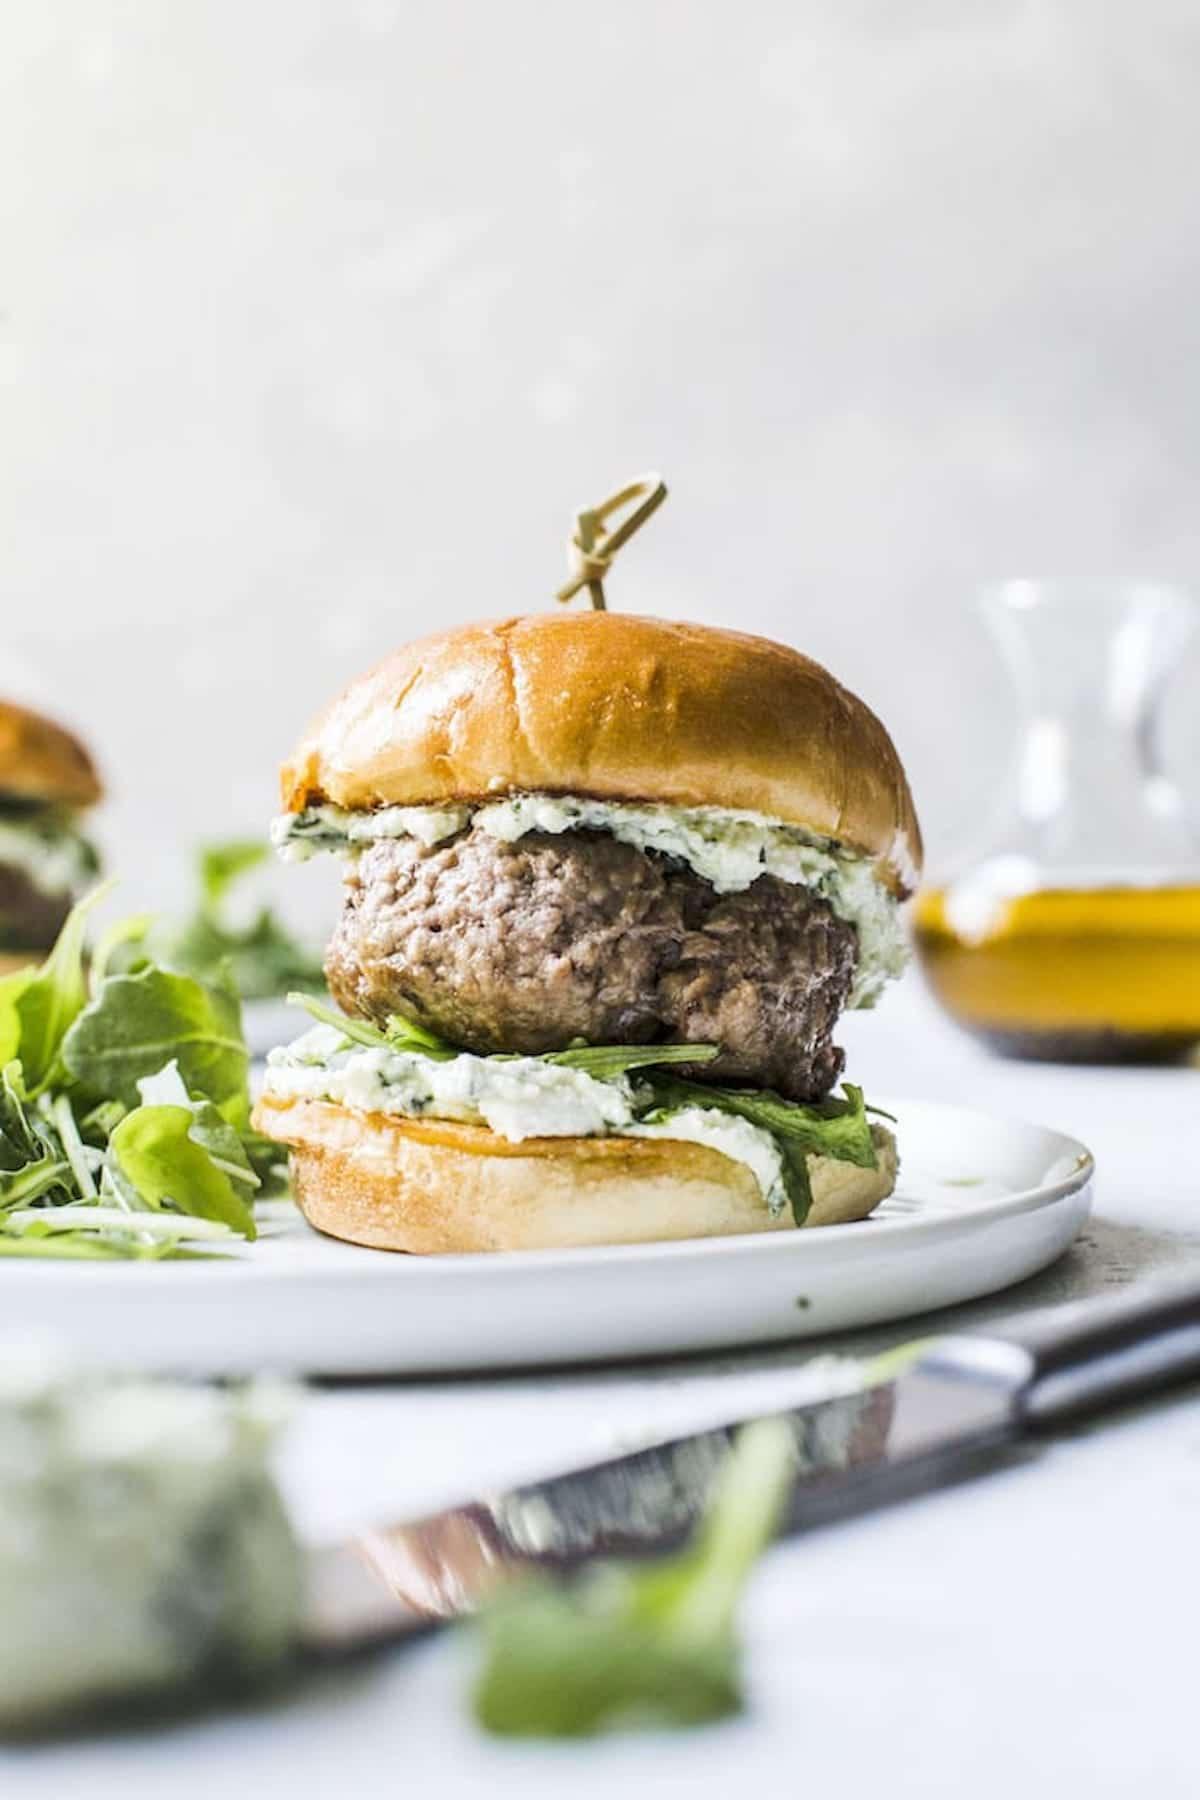 burger on a bun